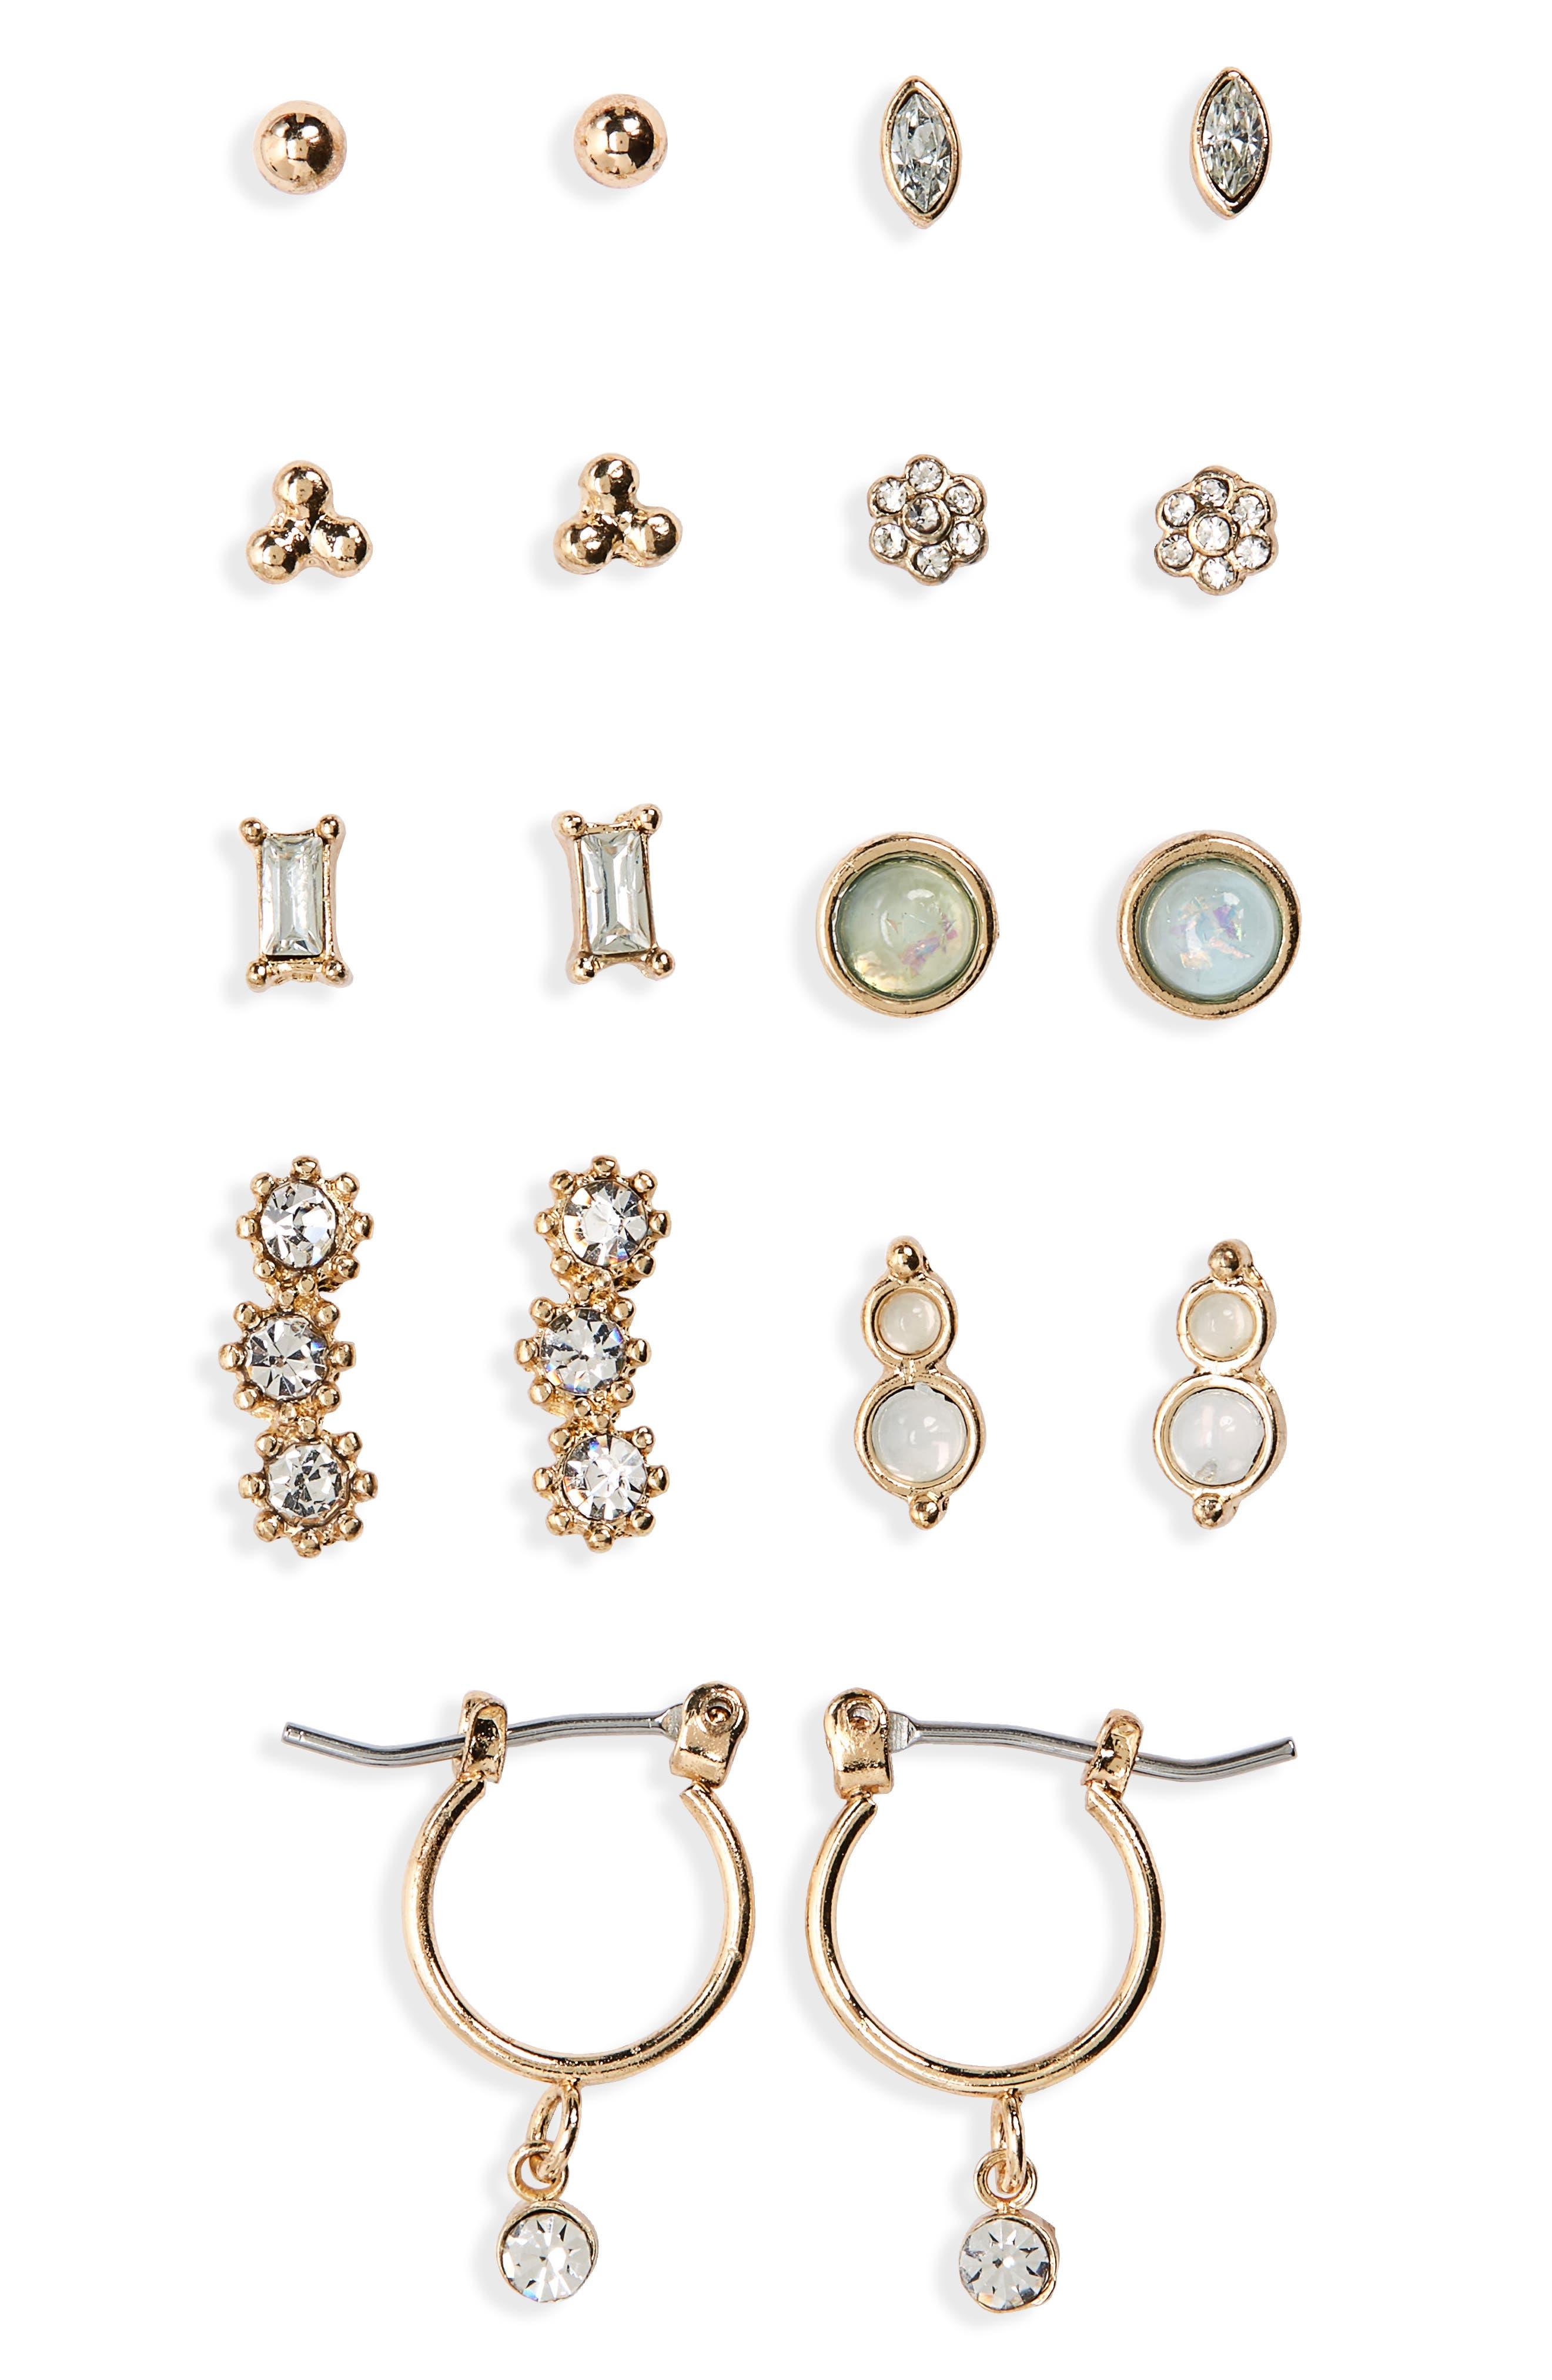 9-Pack Crystal Earrings,                             Main thumbnail 1, color,                             GOLD/ MULTI